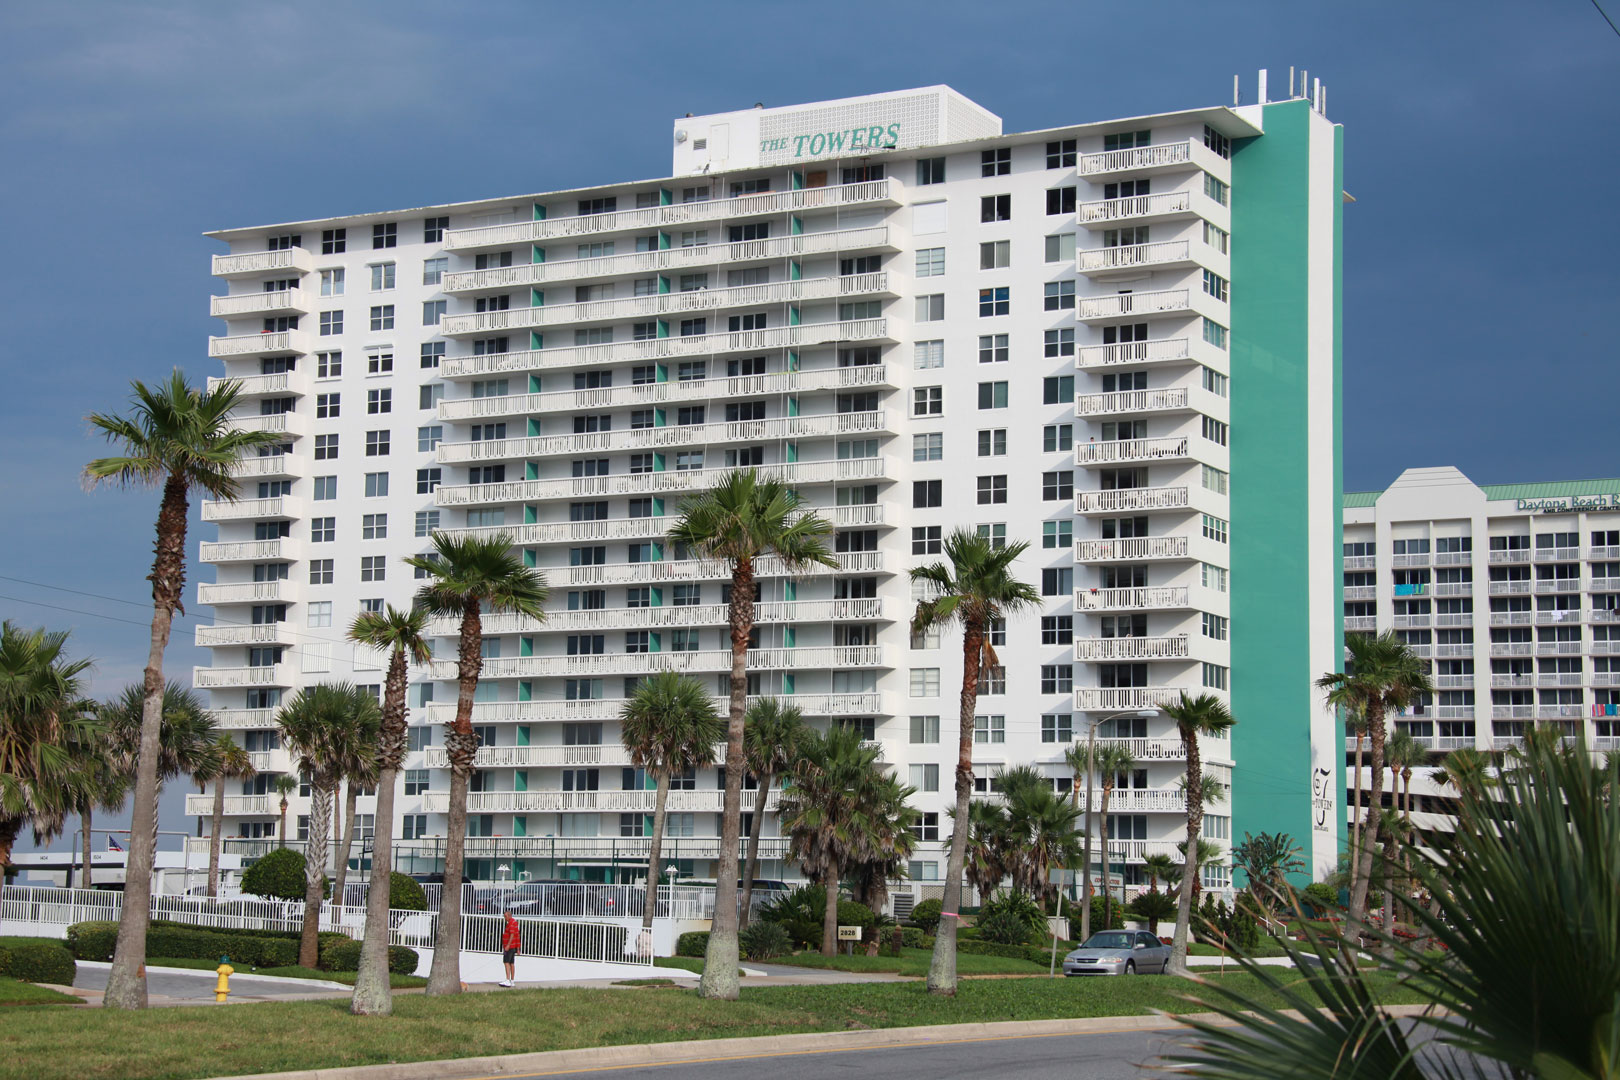 Condo Rentals In Daytona Beach Area